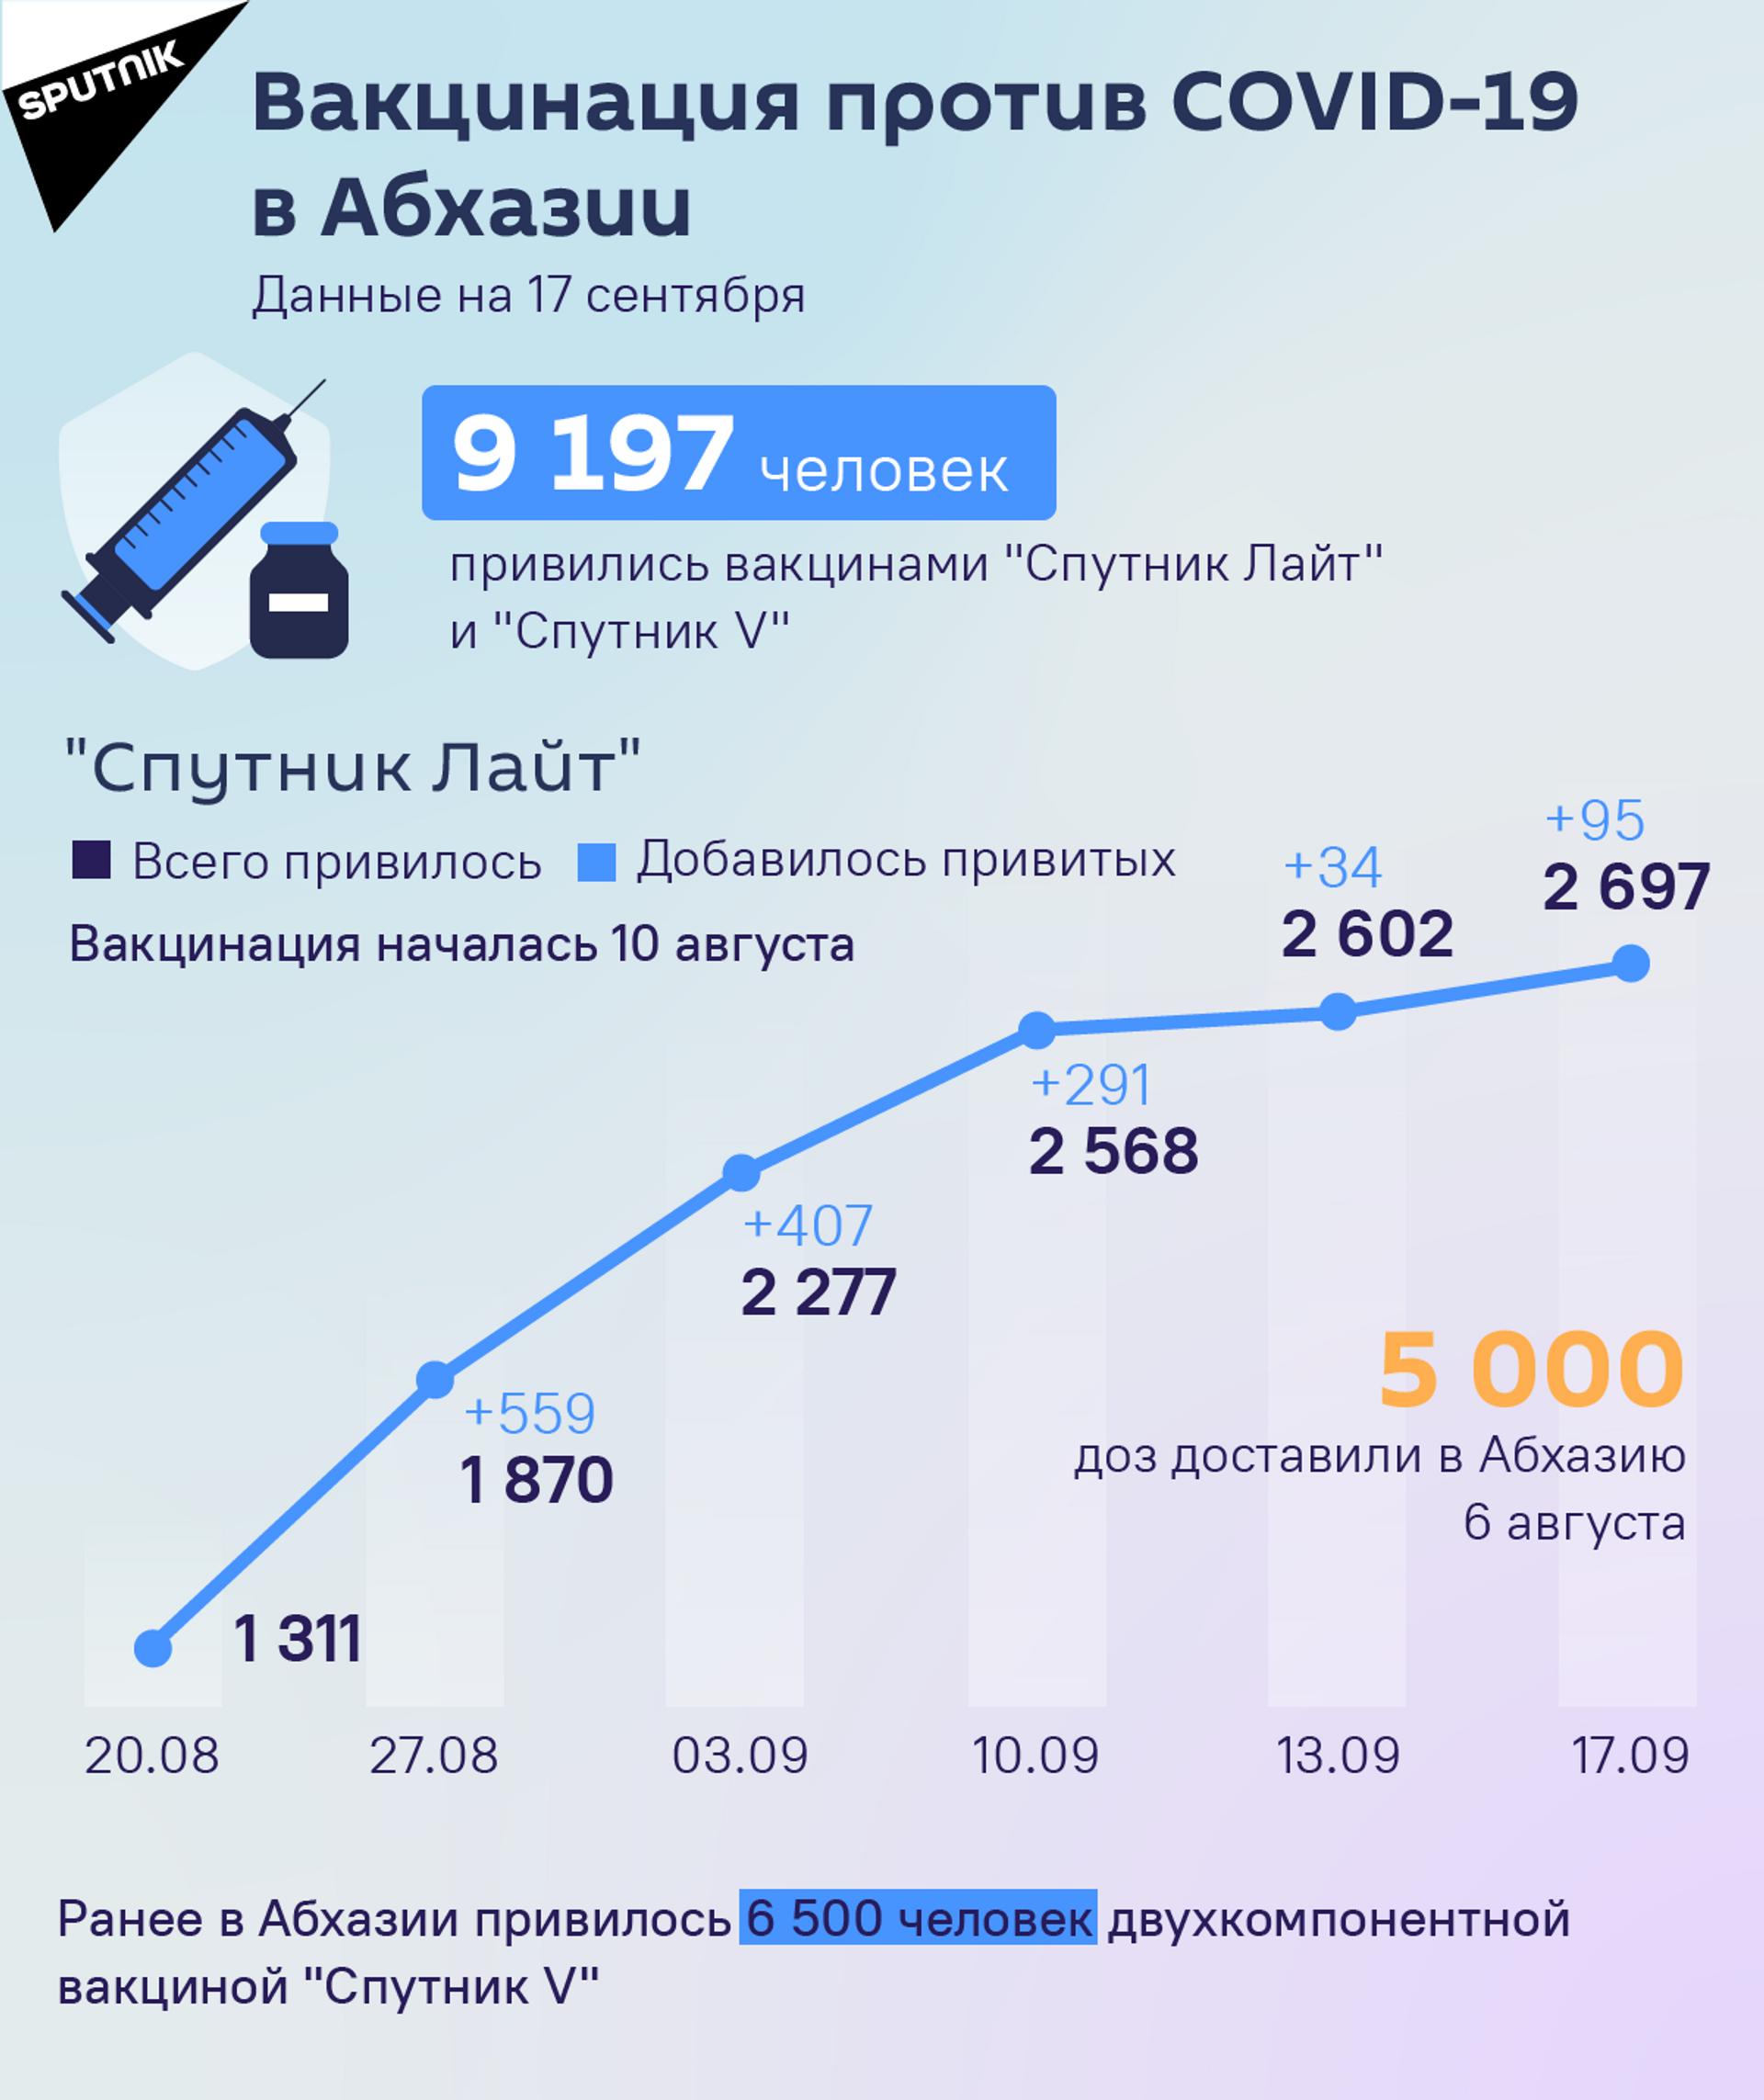 Вакцинация против COVID-19 в Абхазии  - Sputnik Абхазия, 1920, 12.10.2021